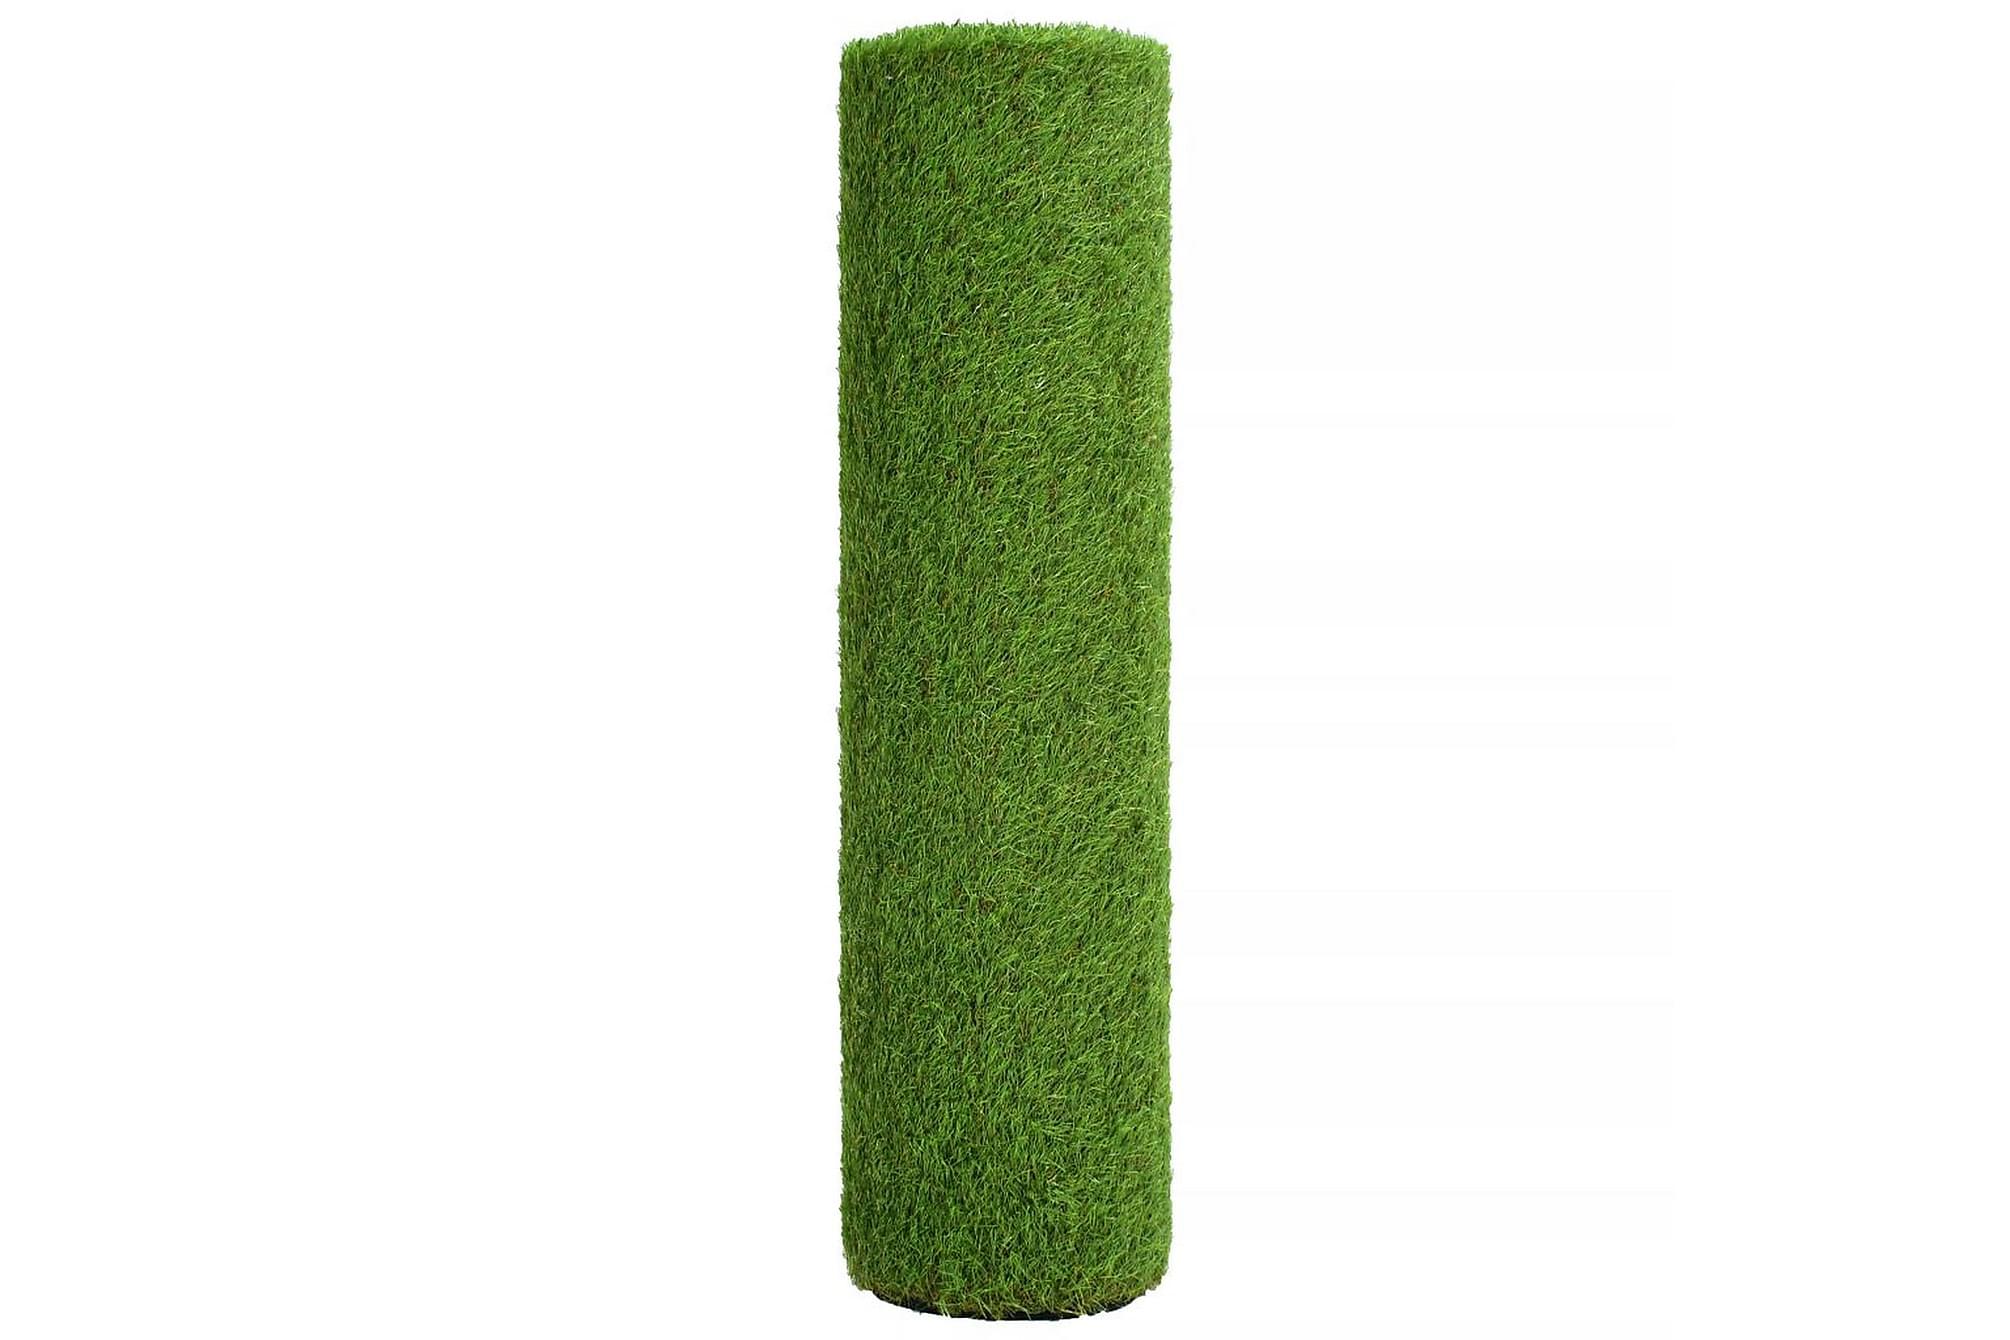 Konstgräsmatta 1×5 m/40 mm grön